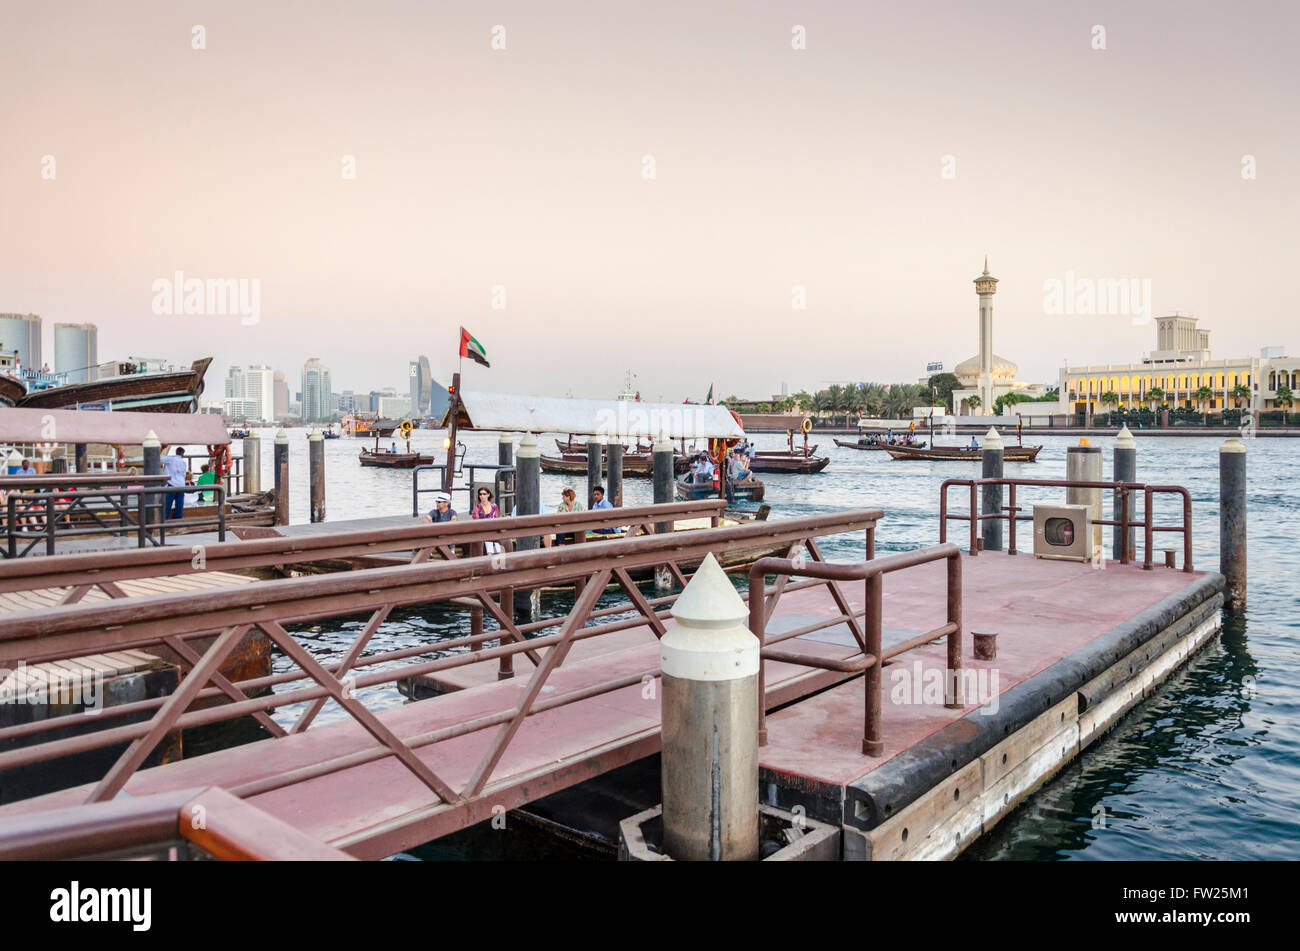 Dubai Creek Abra Station near Baniyas Road, Al Ras, UAE - Stock Image